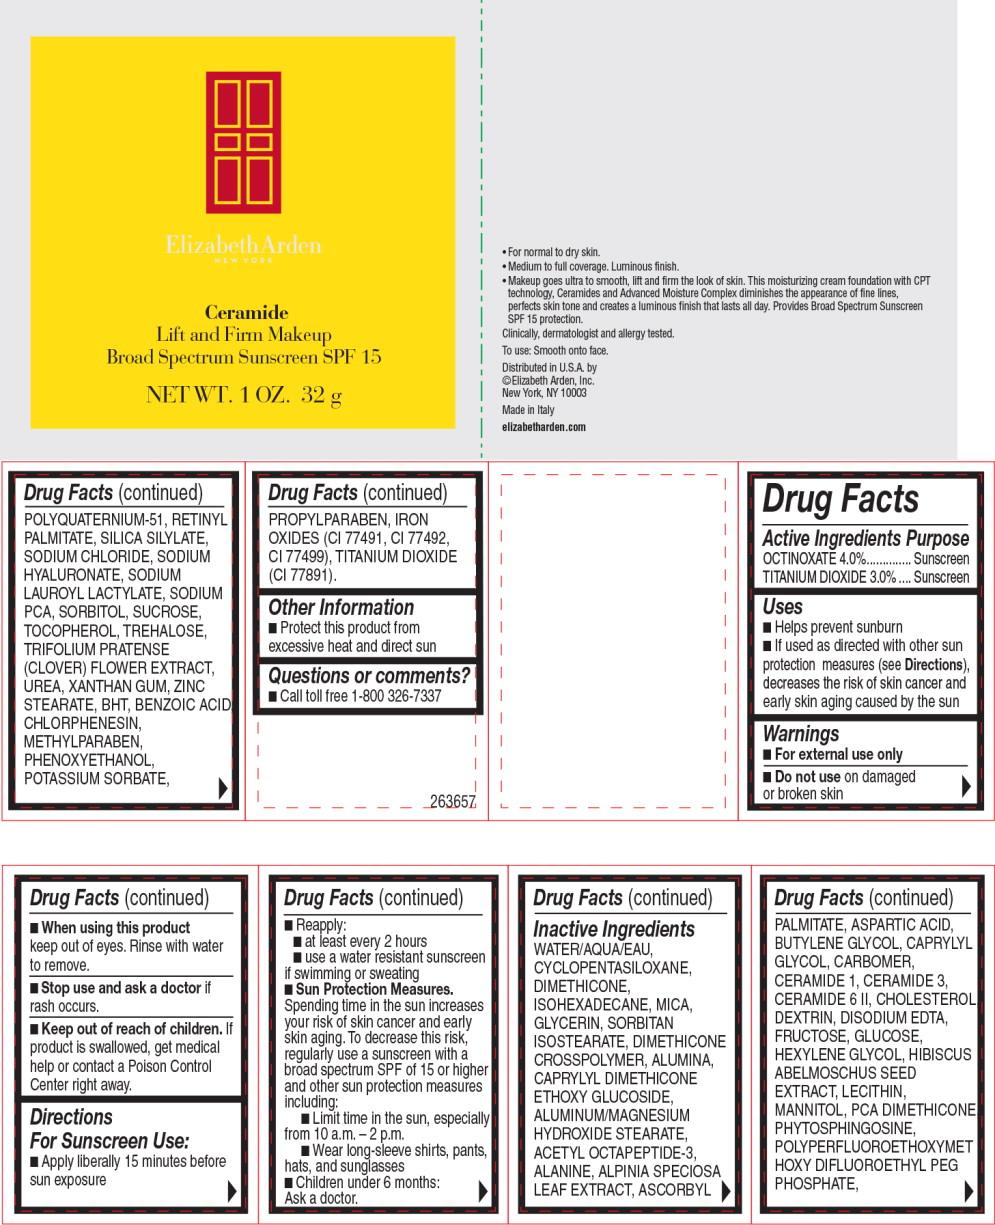 Edarbi (Azilsartan Kamedoxomil) Tablet [Arbor Pharmaceuticals Ireland Limited]